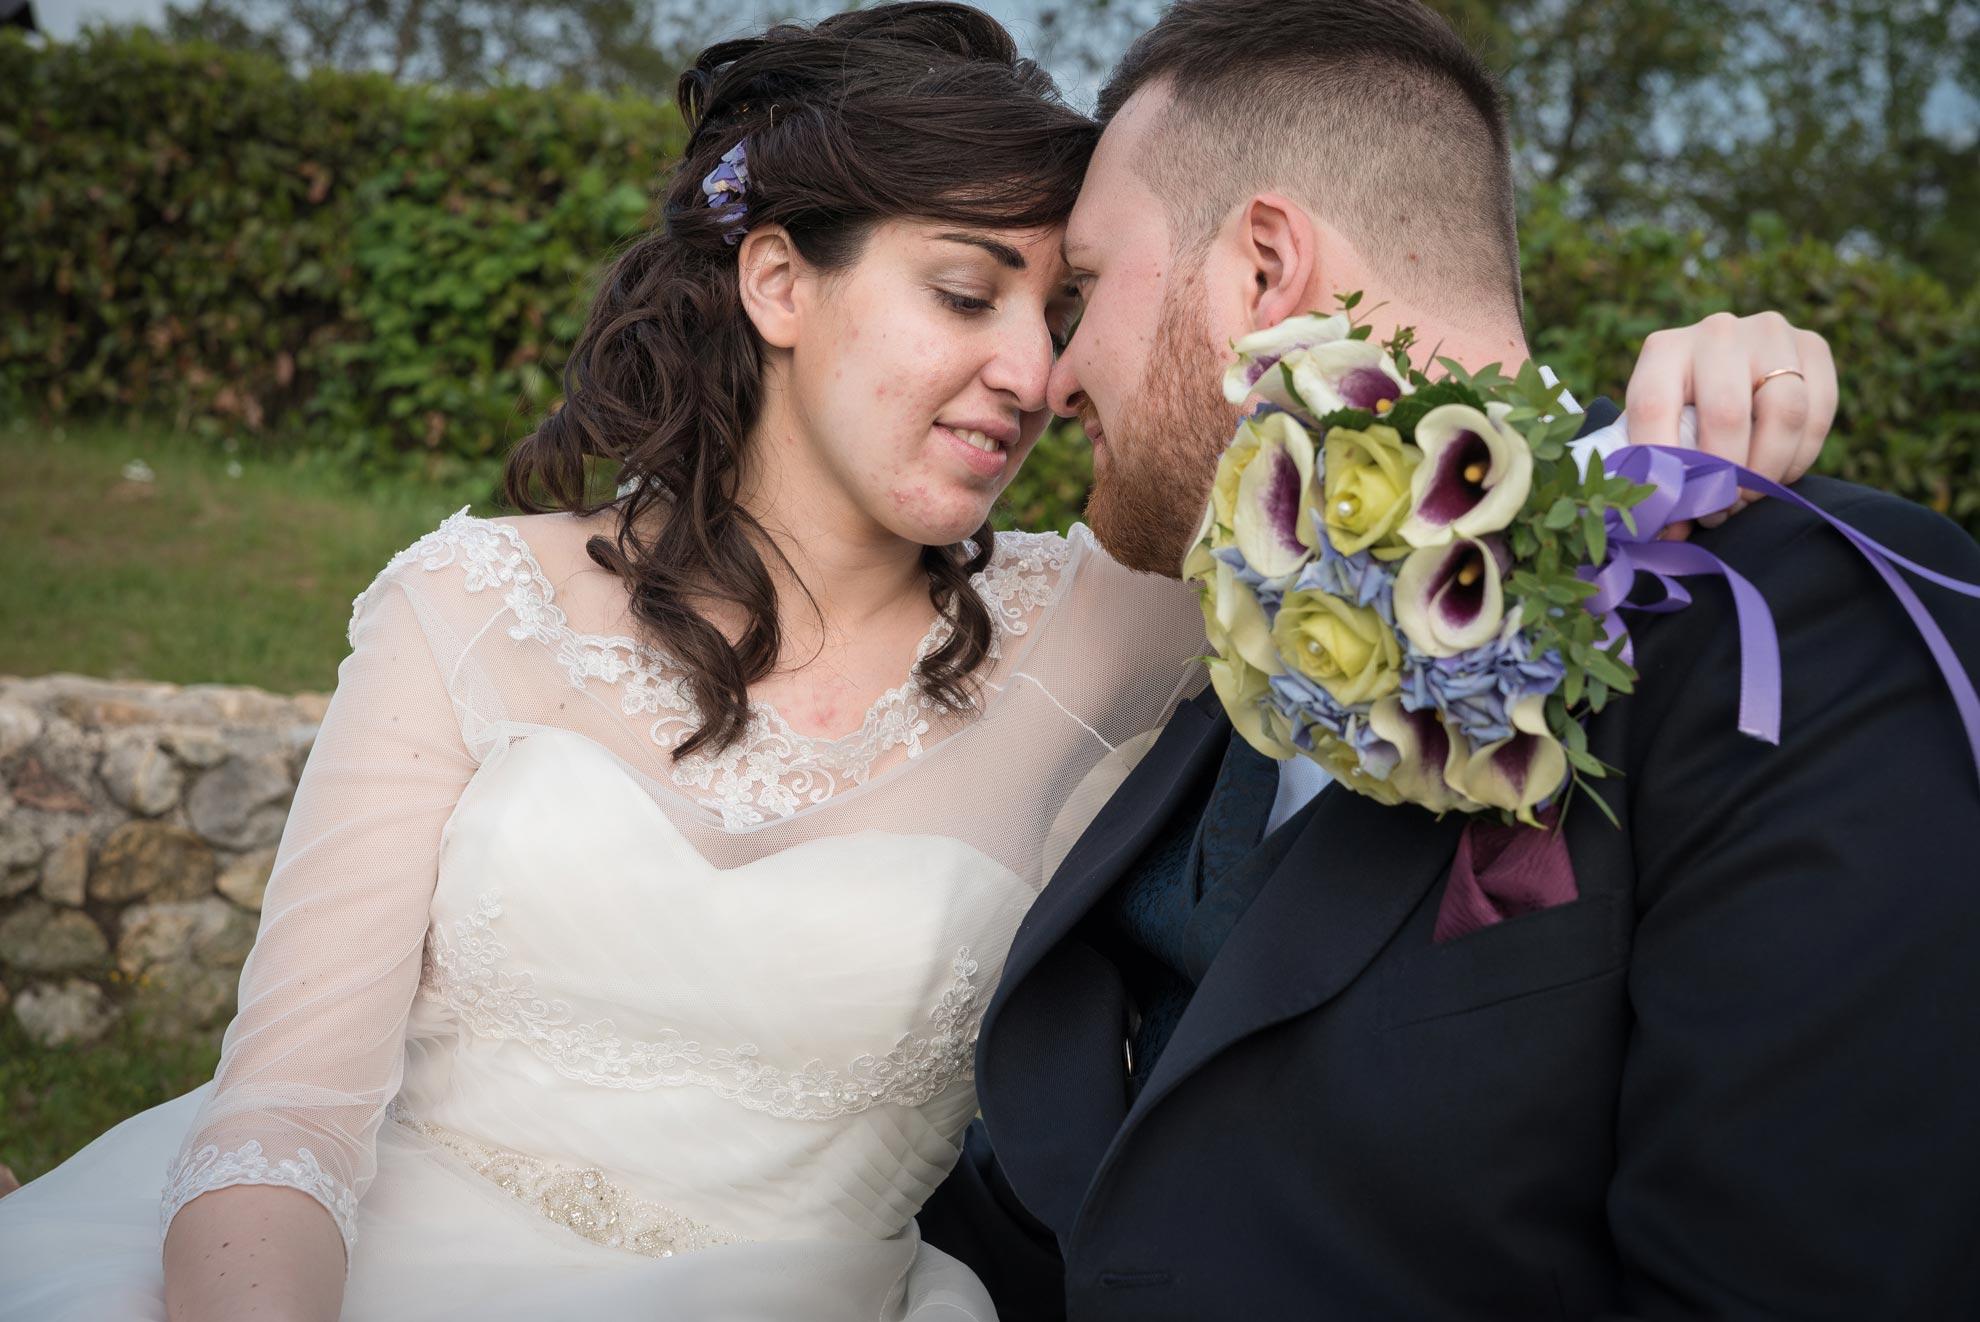 Matrimonio a Narzole Lorenza Diego - DSC 3251 - Fotografie matrimonio con buchè - Fotografie matrimonio con buchè